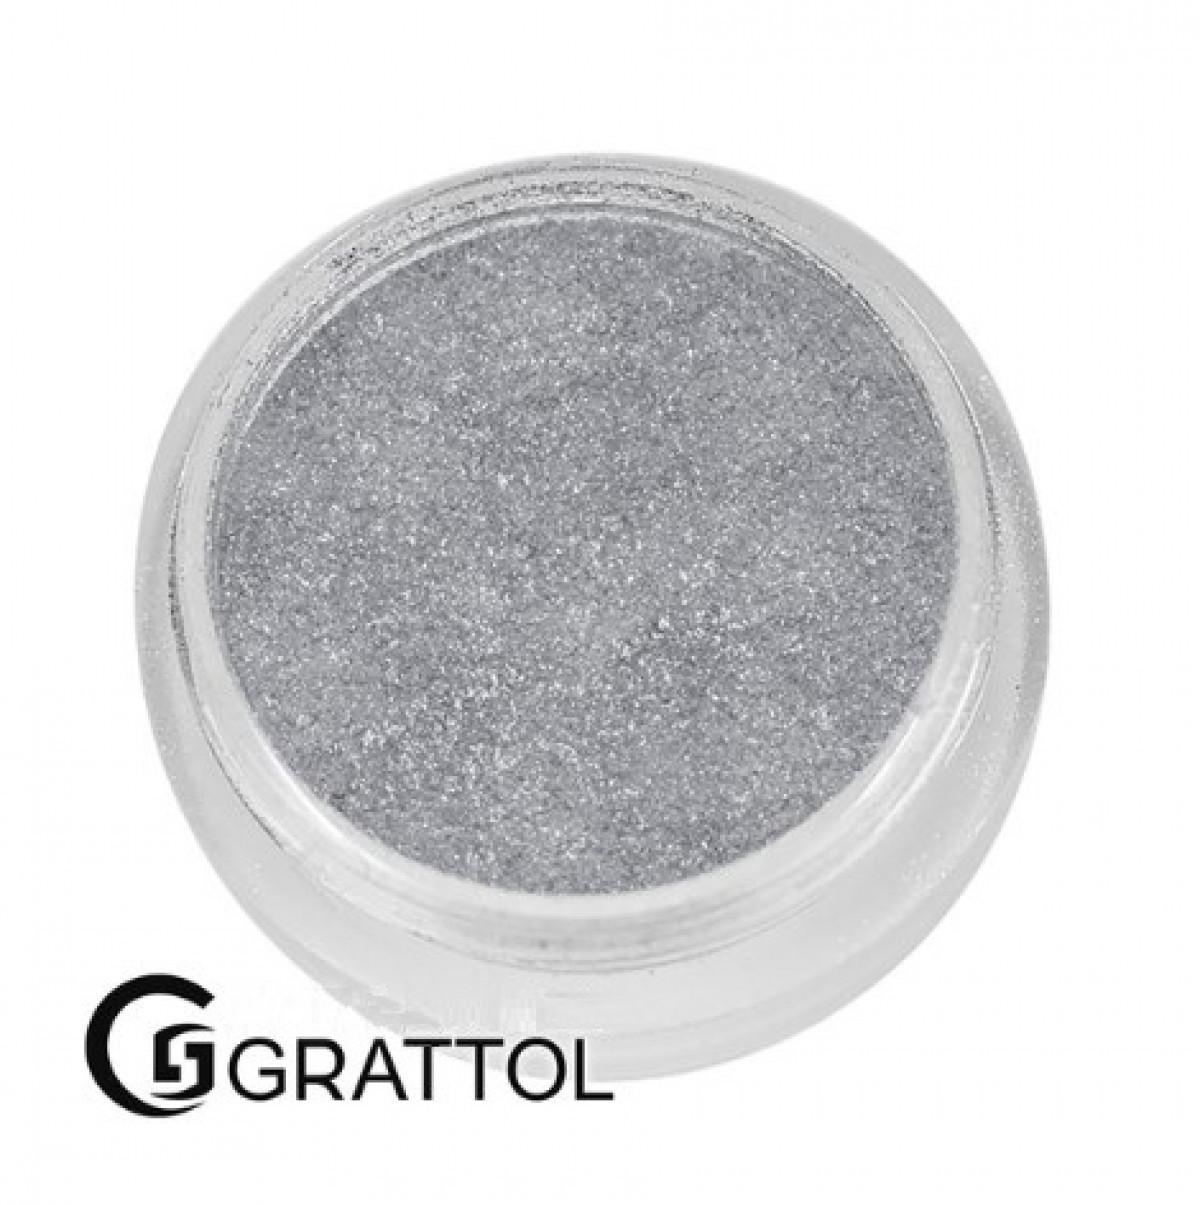 Зеркальная втирка Mirror Powder Silver 01, 1,1 г Grattol